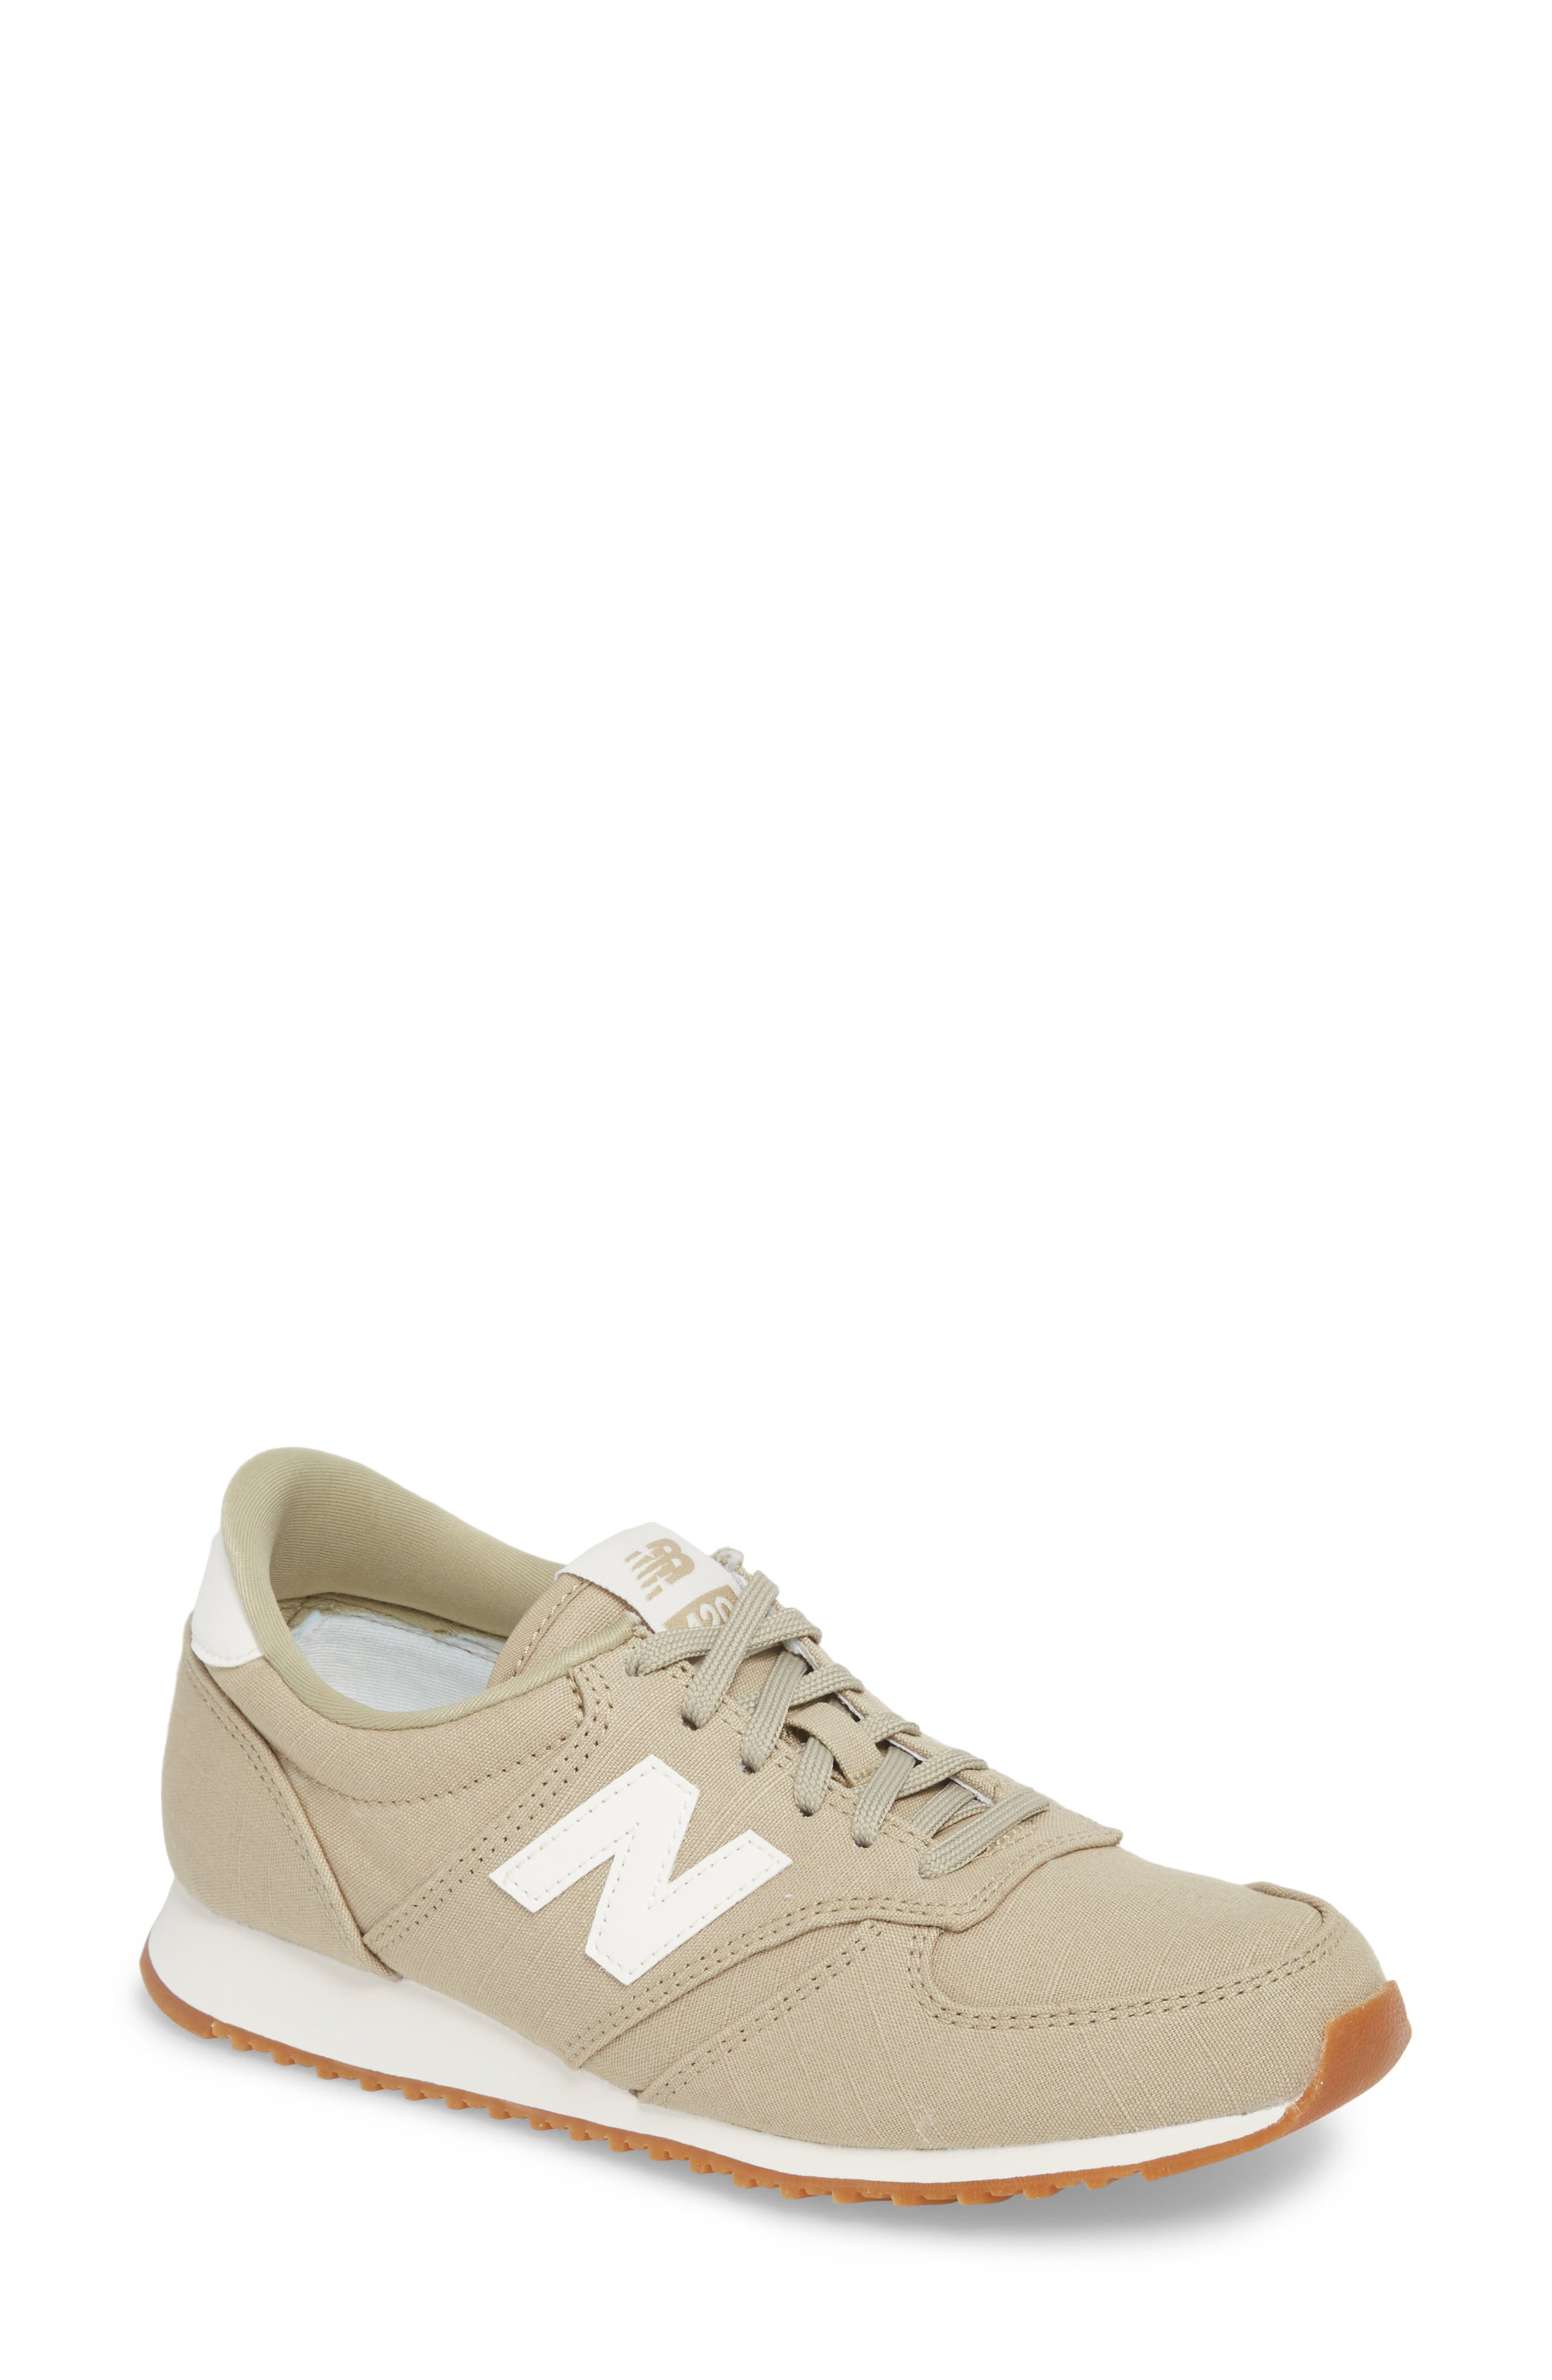 New Balance 420 Sneaker (Women)